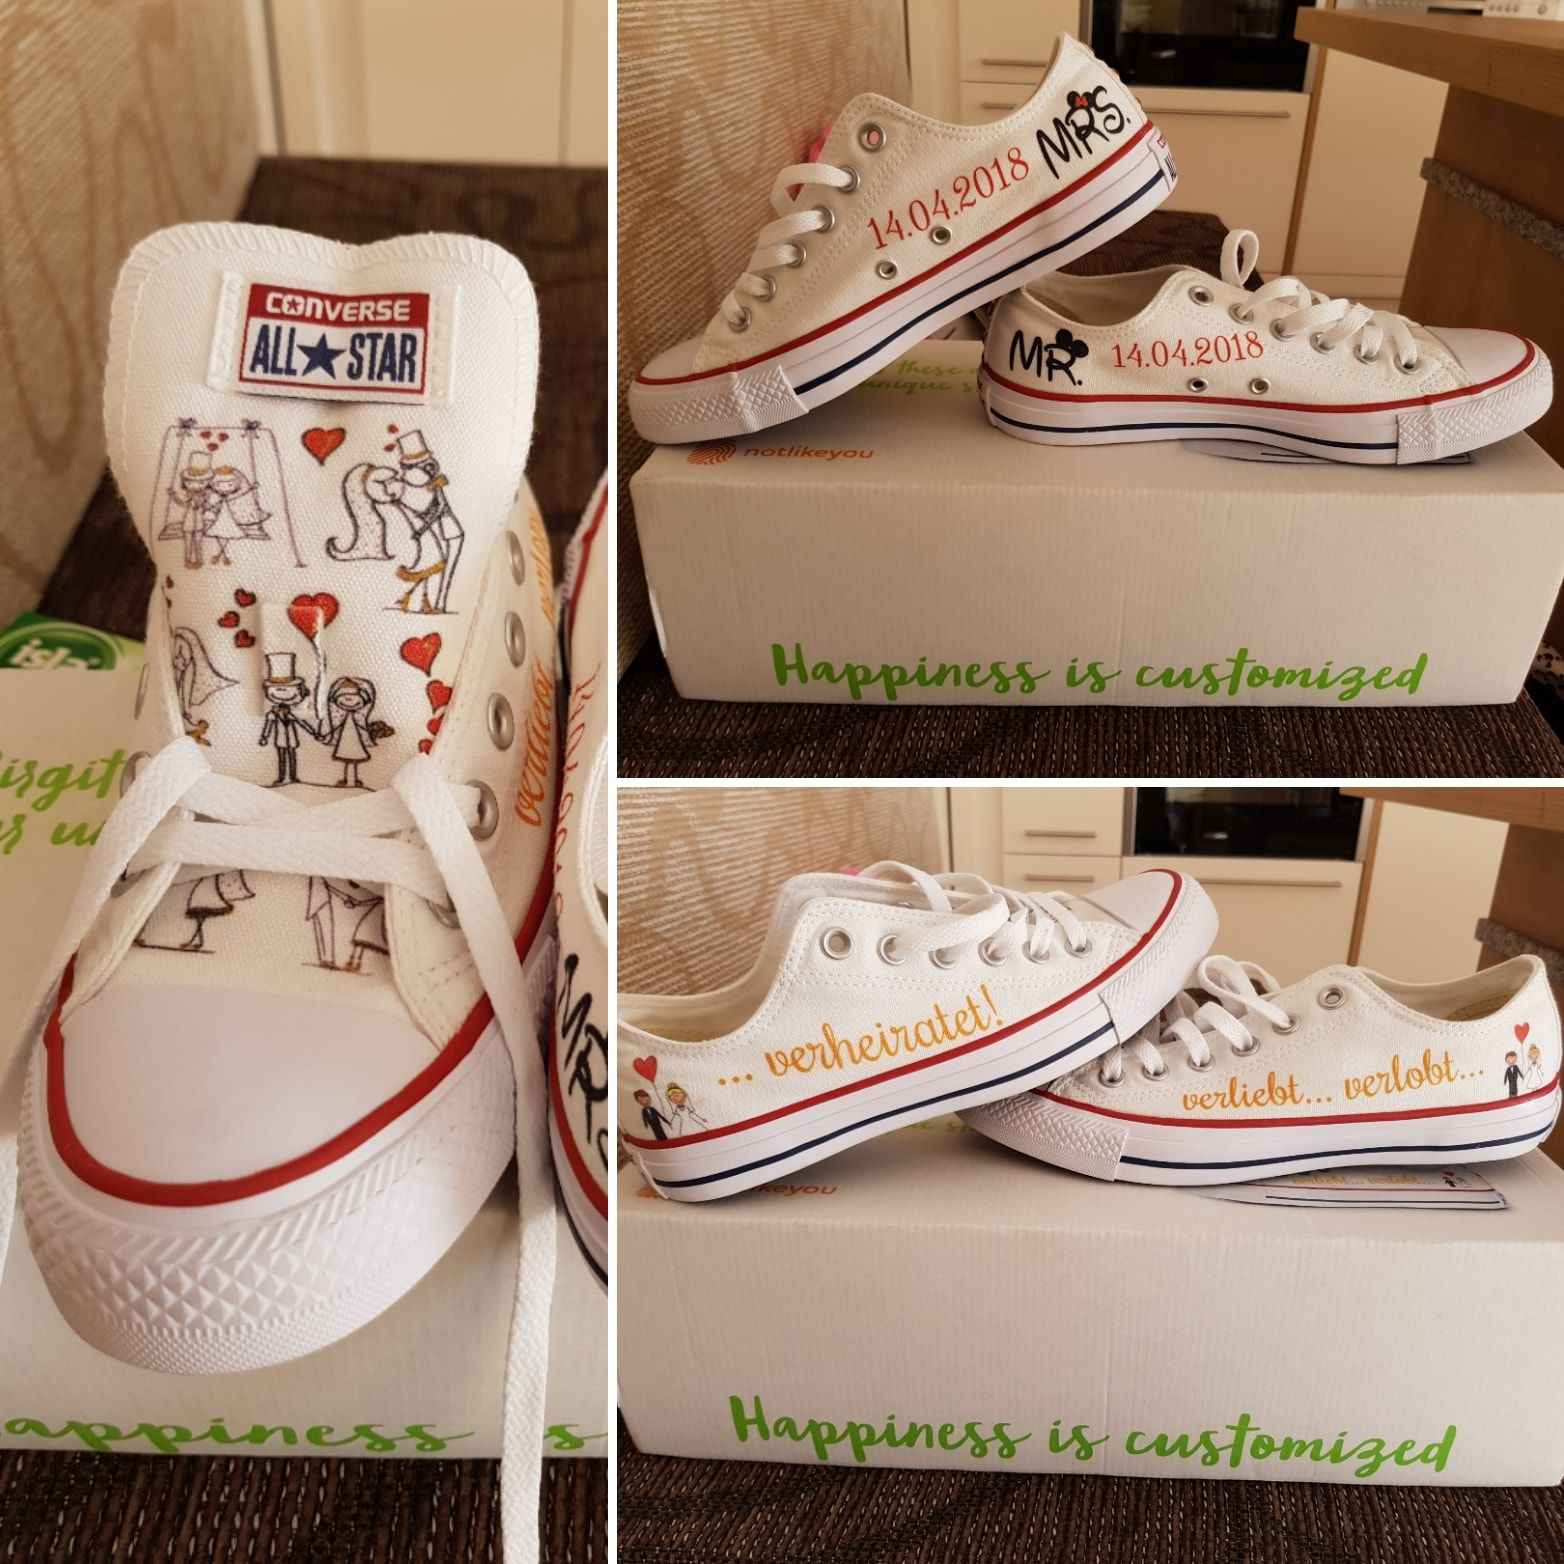 Customized Wedding Converse Chucks By Notlikeyou Converse Hochzeit Meine Hochzeit Hochzeit Planen